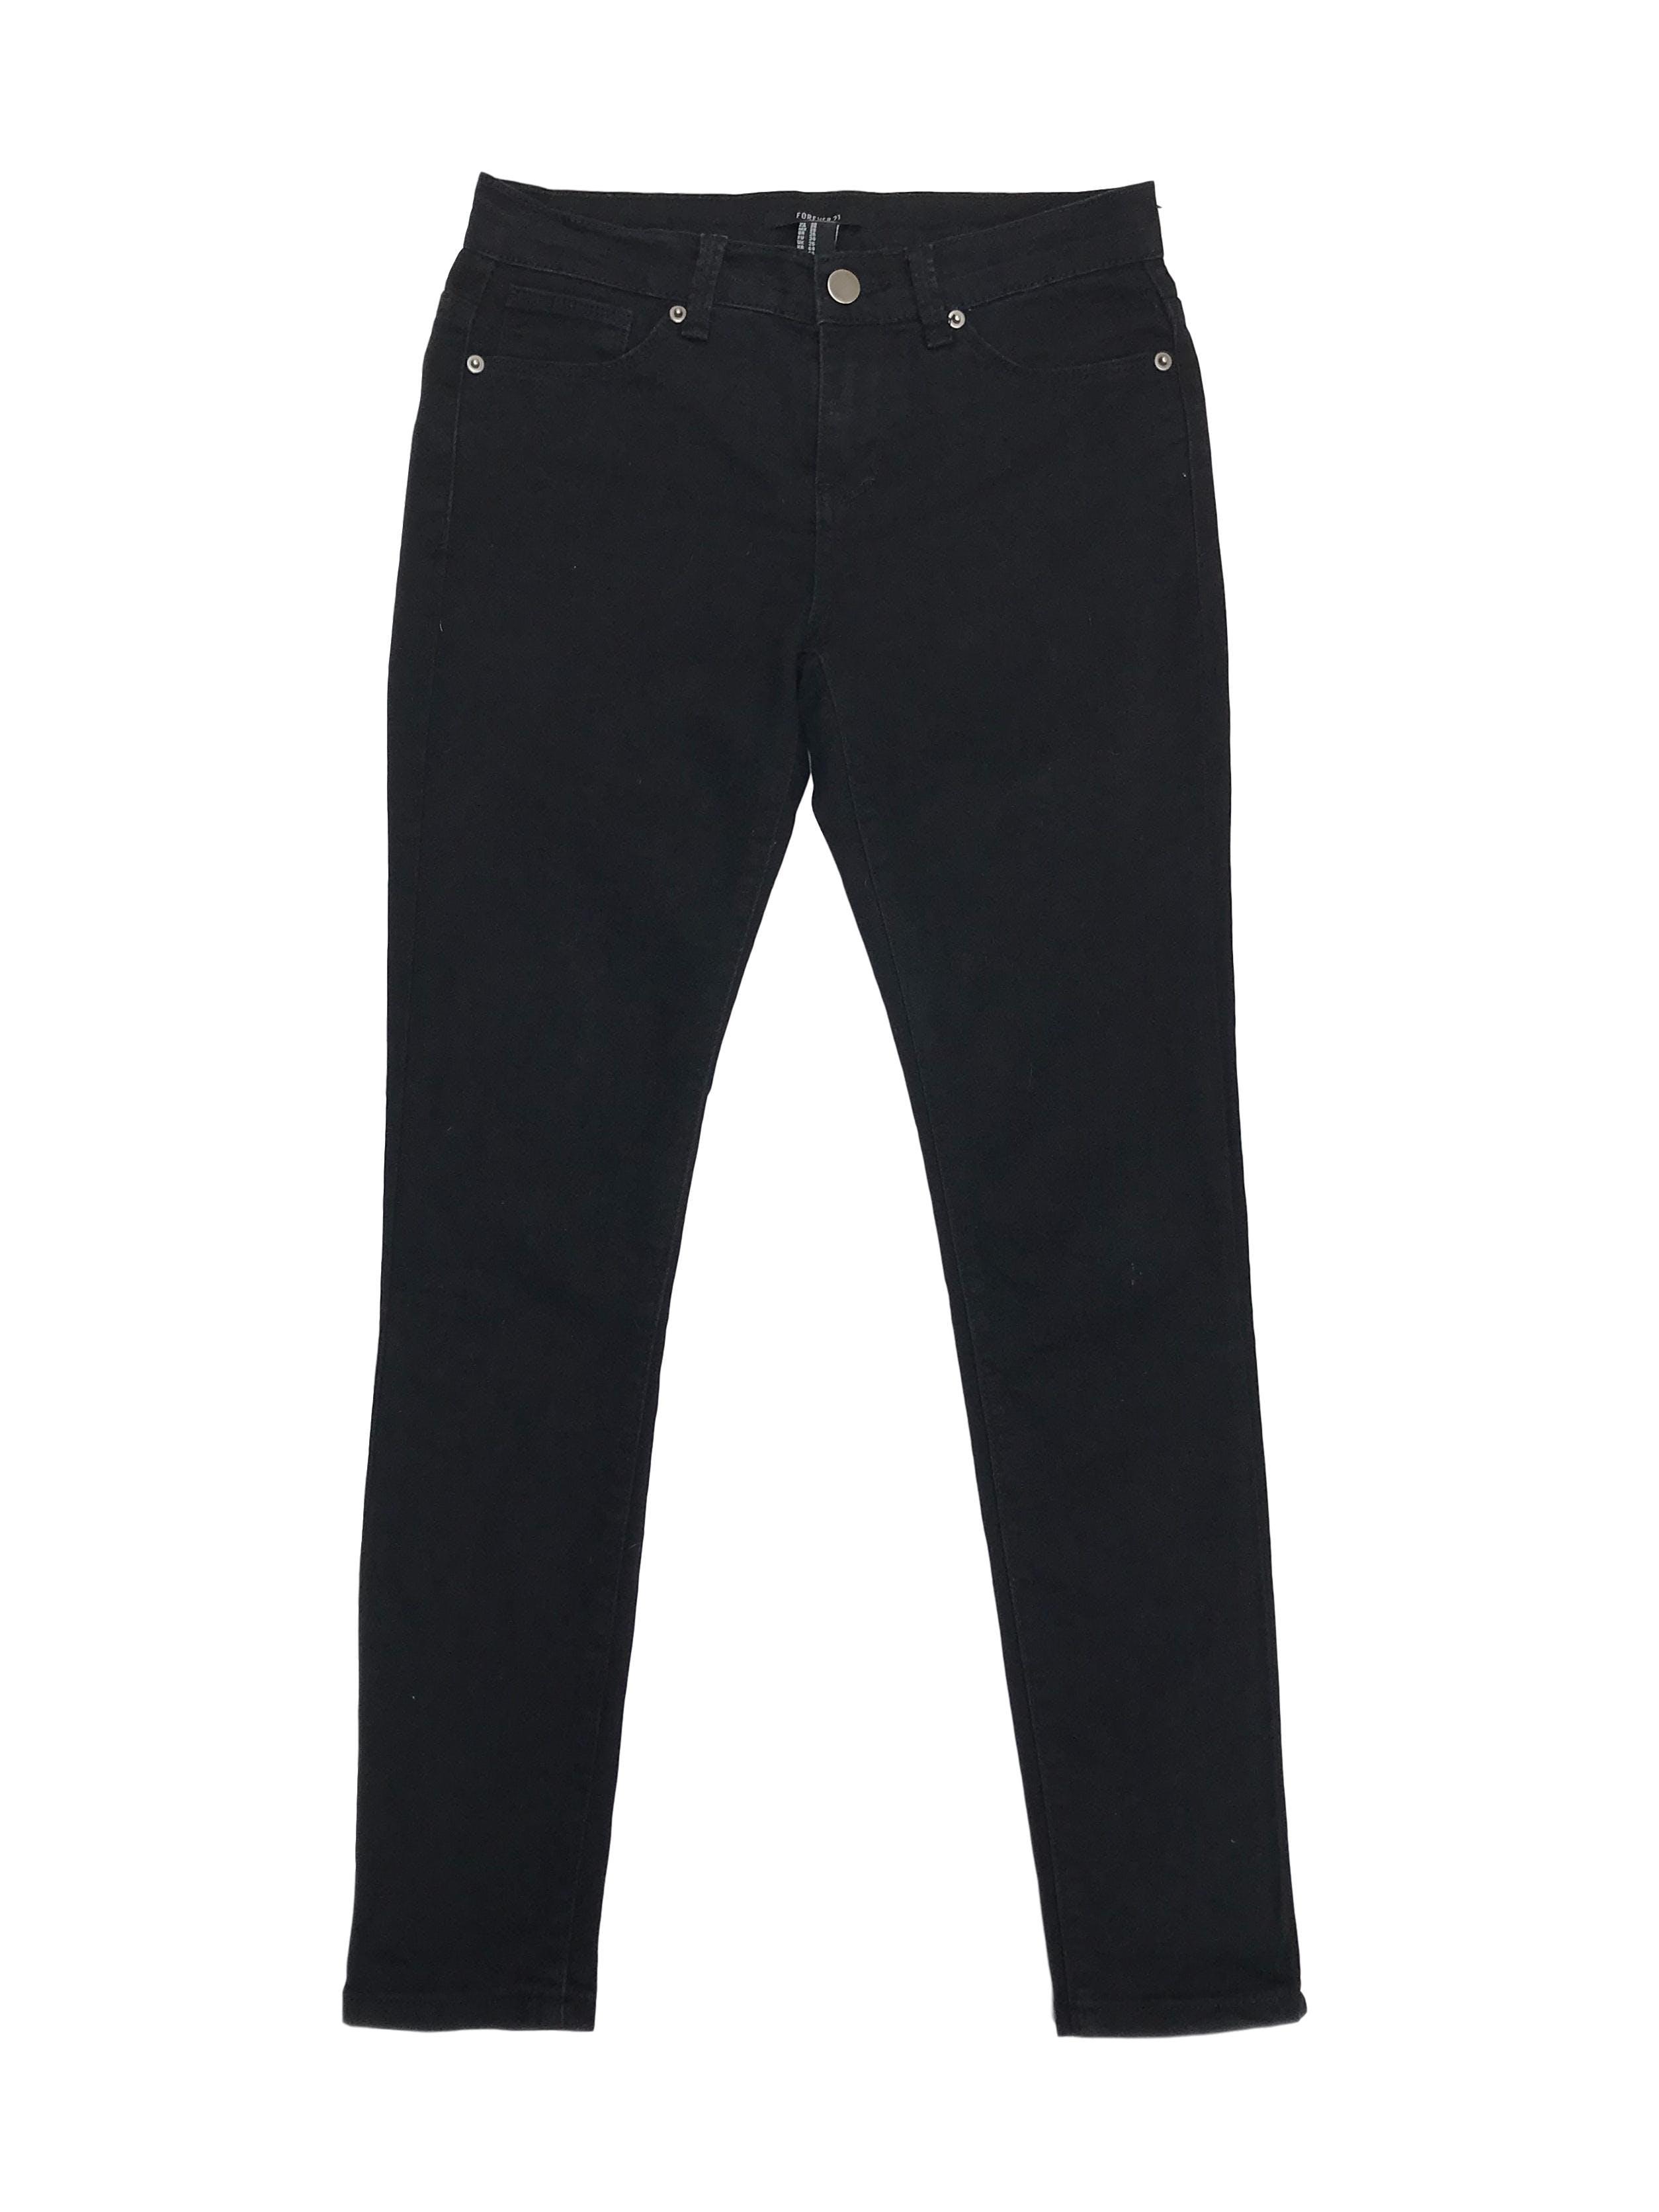 Pantalón jean pitillo Forever21 negro 61% algodón ligeramente stretch. Pretina 70cm